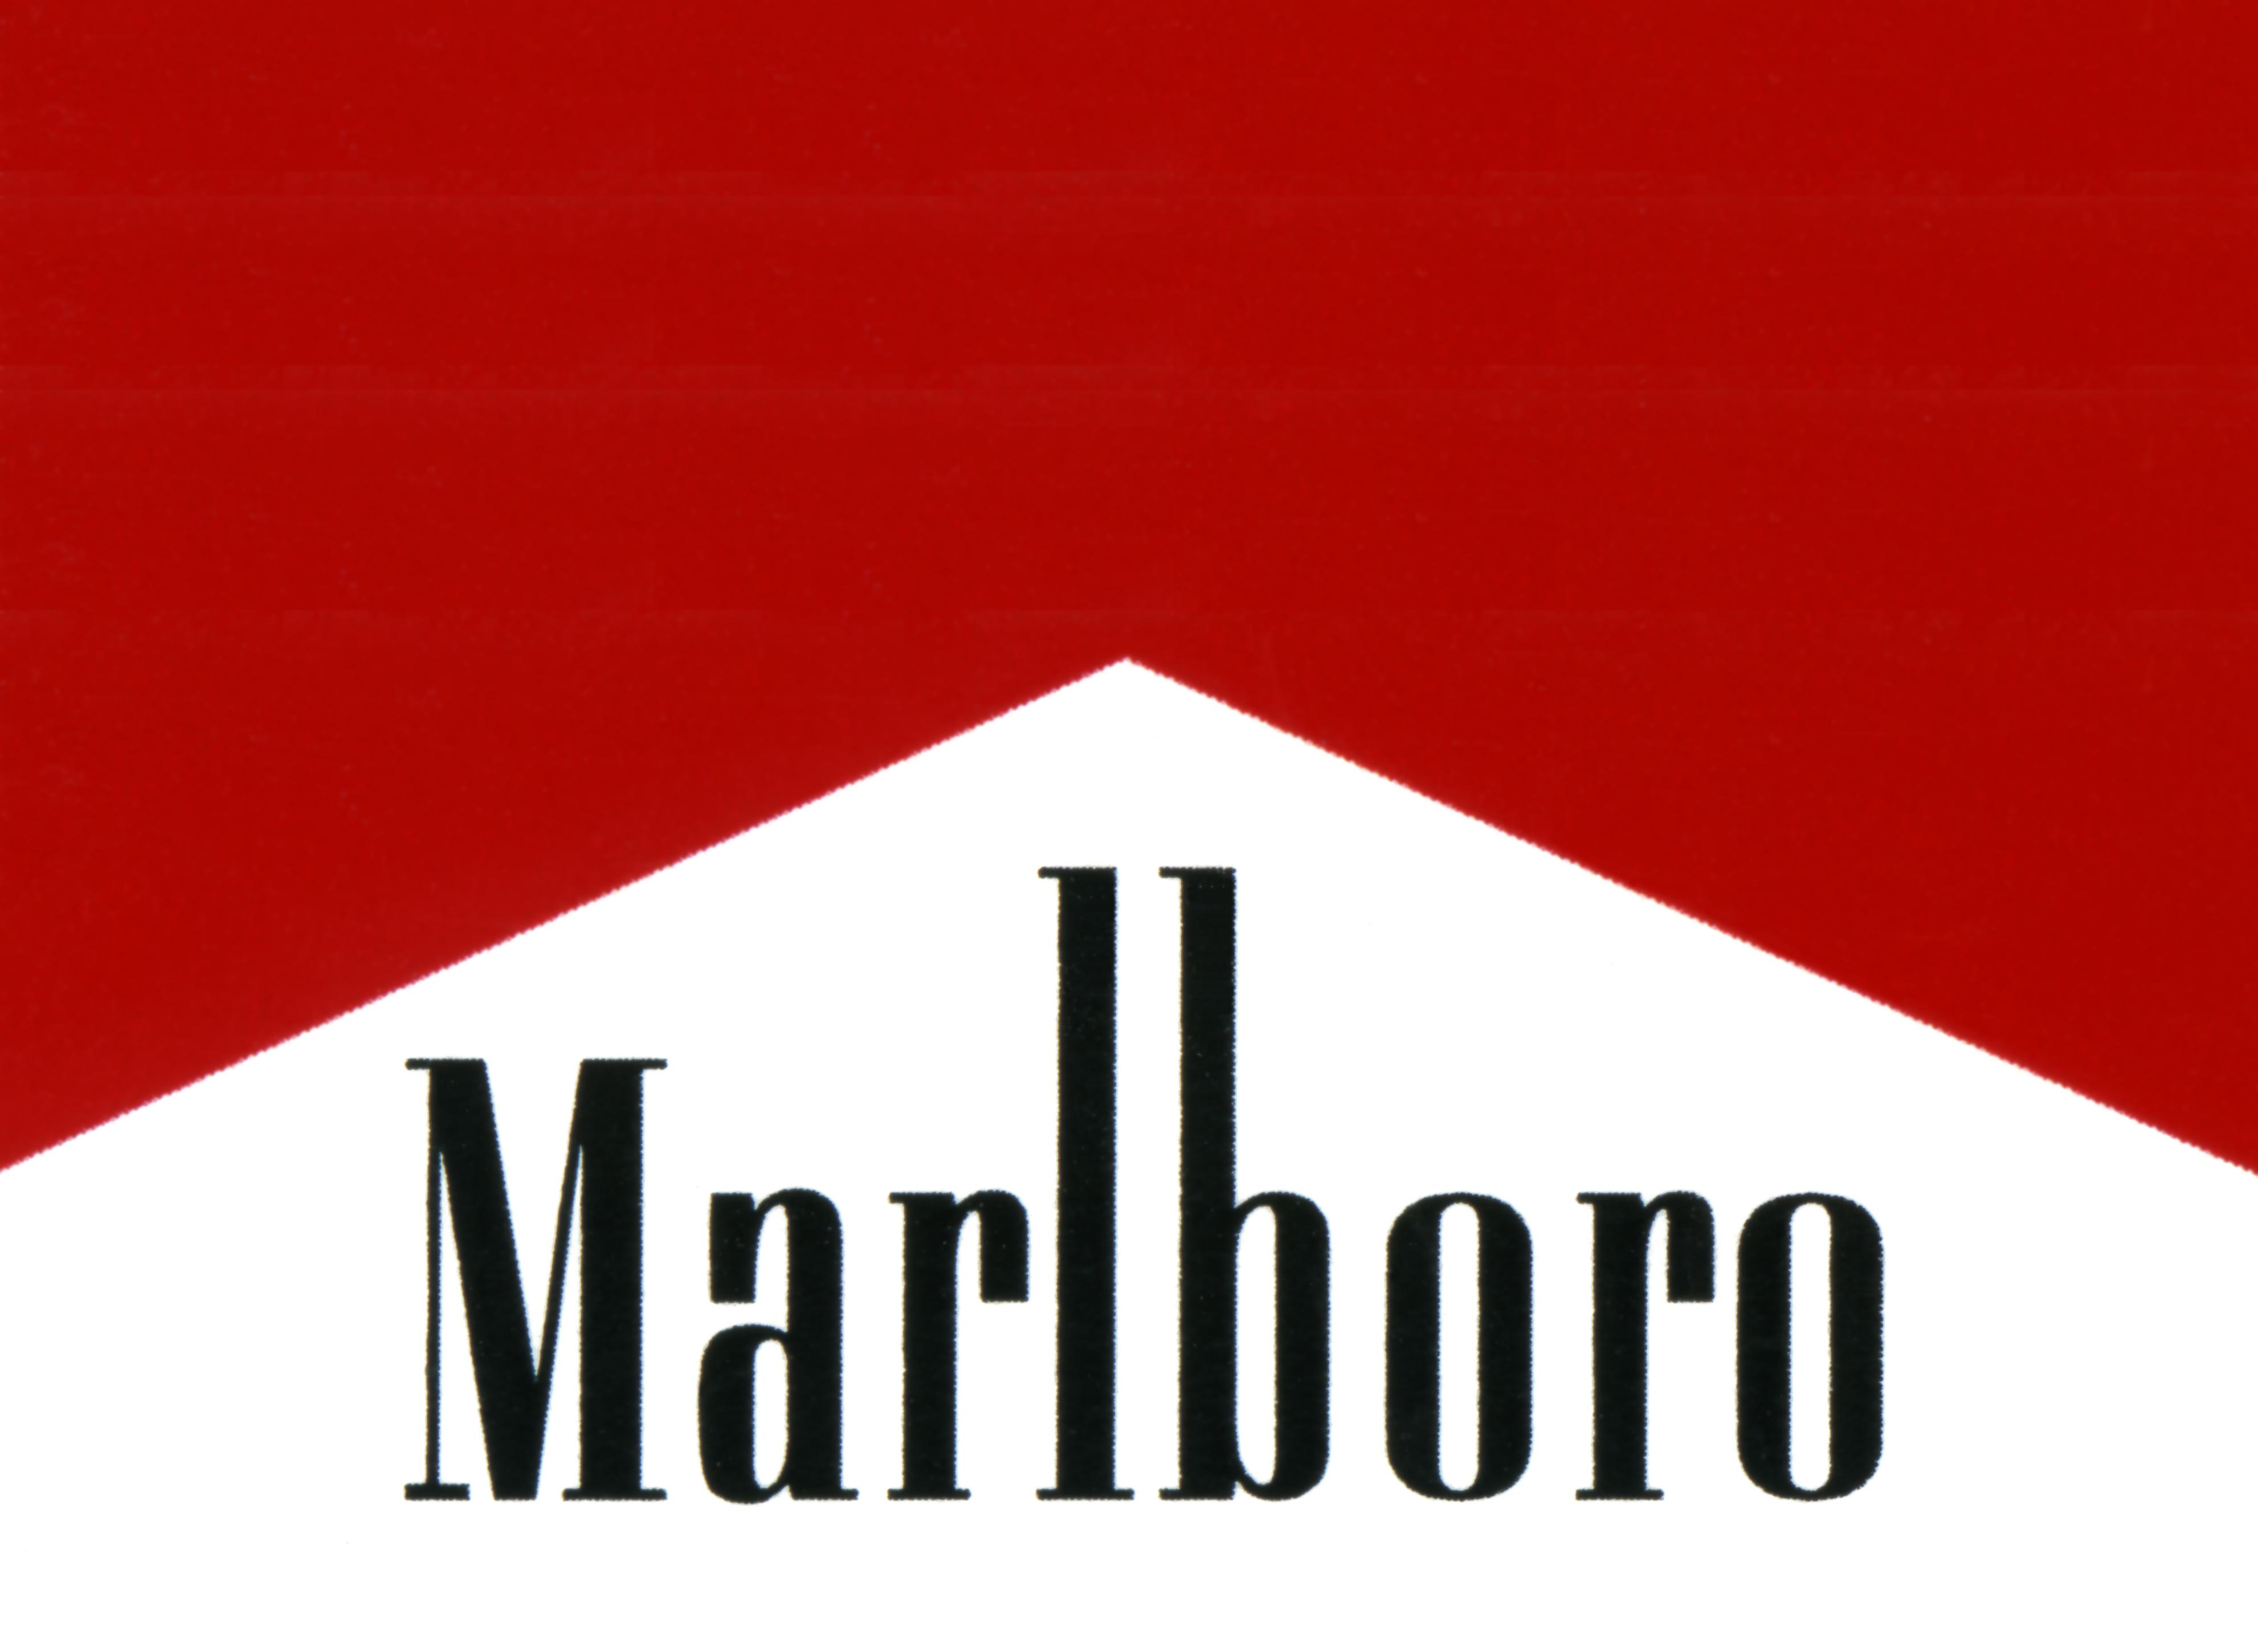 Marlboro Black 104jpg 3963x2900